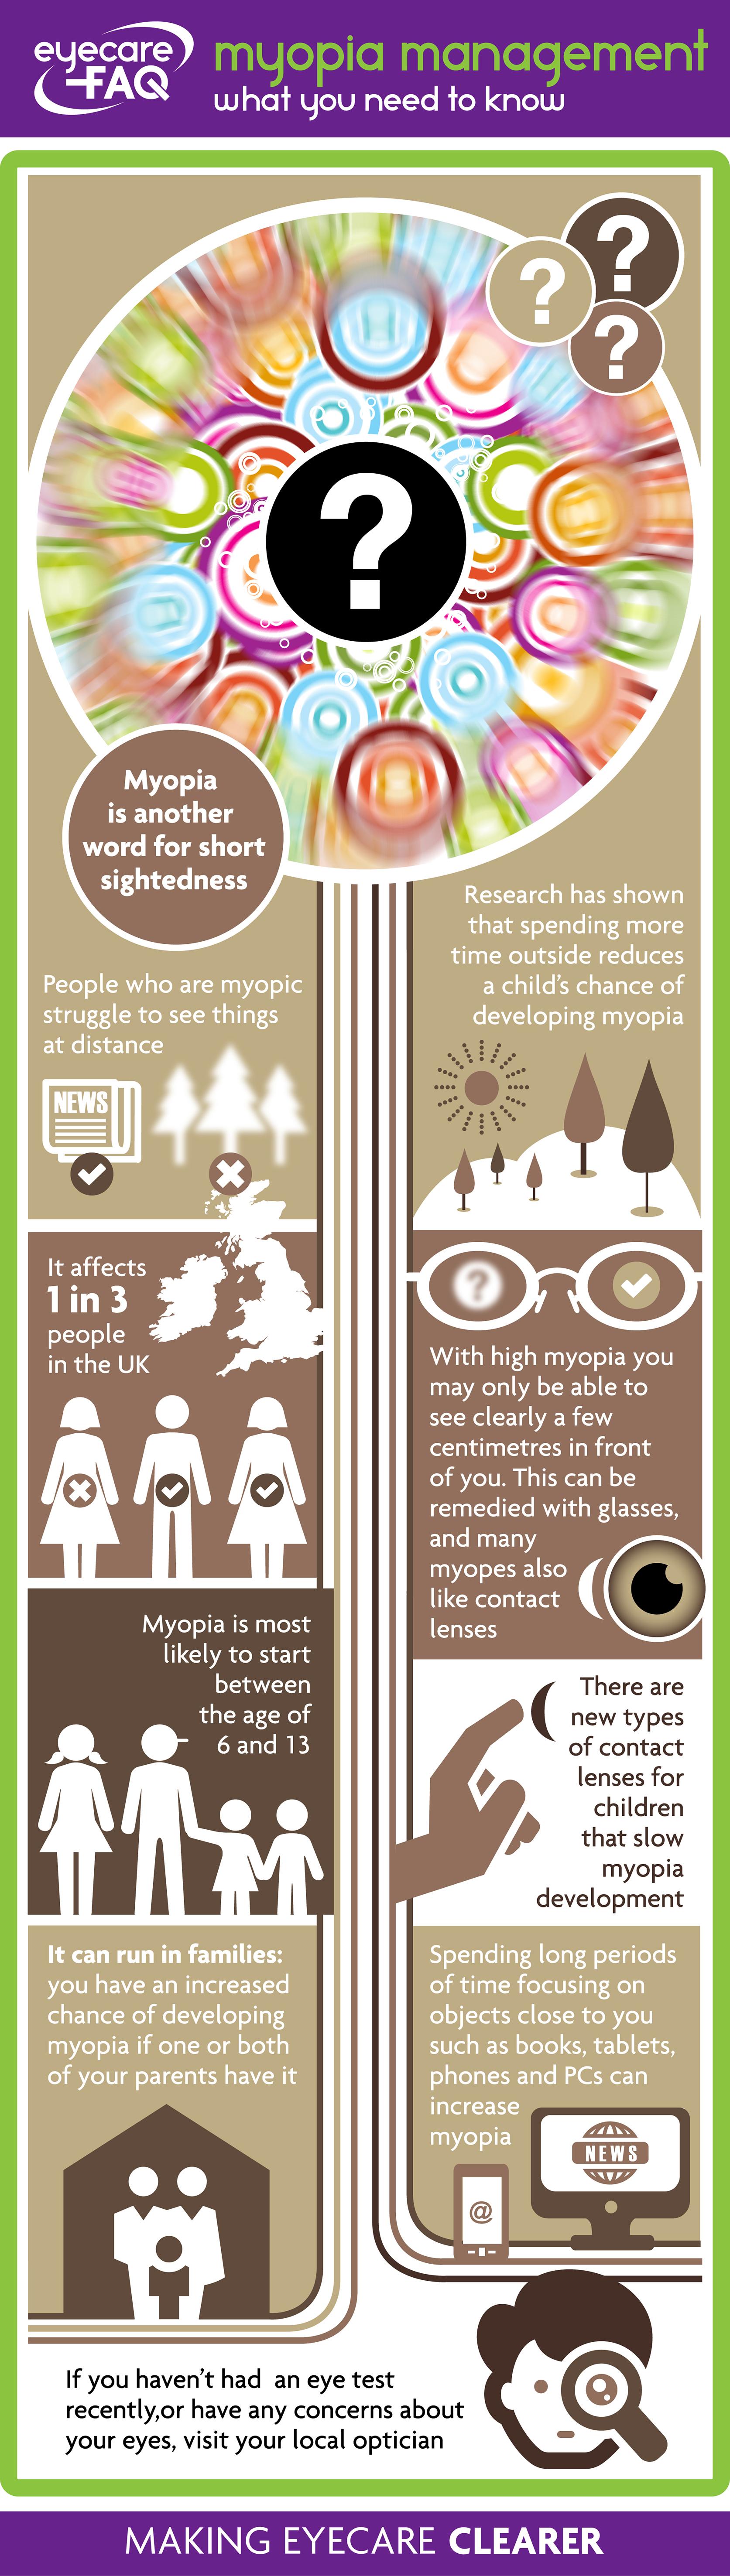 getting stronger myopia forum a látásjavulás valós